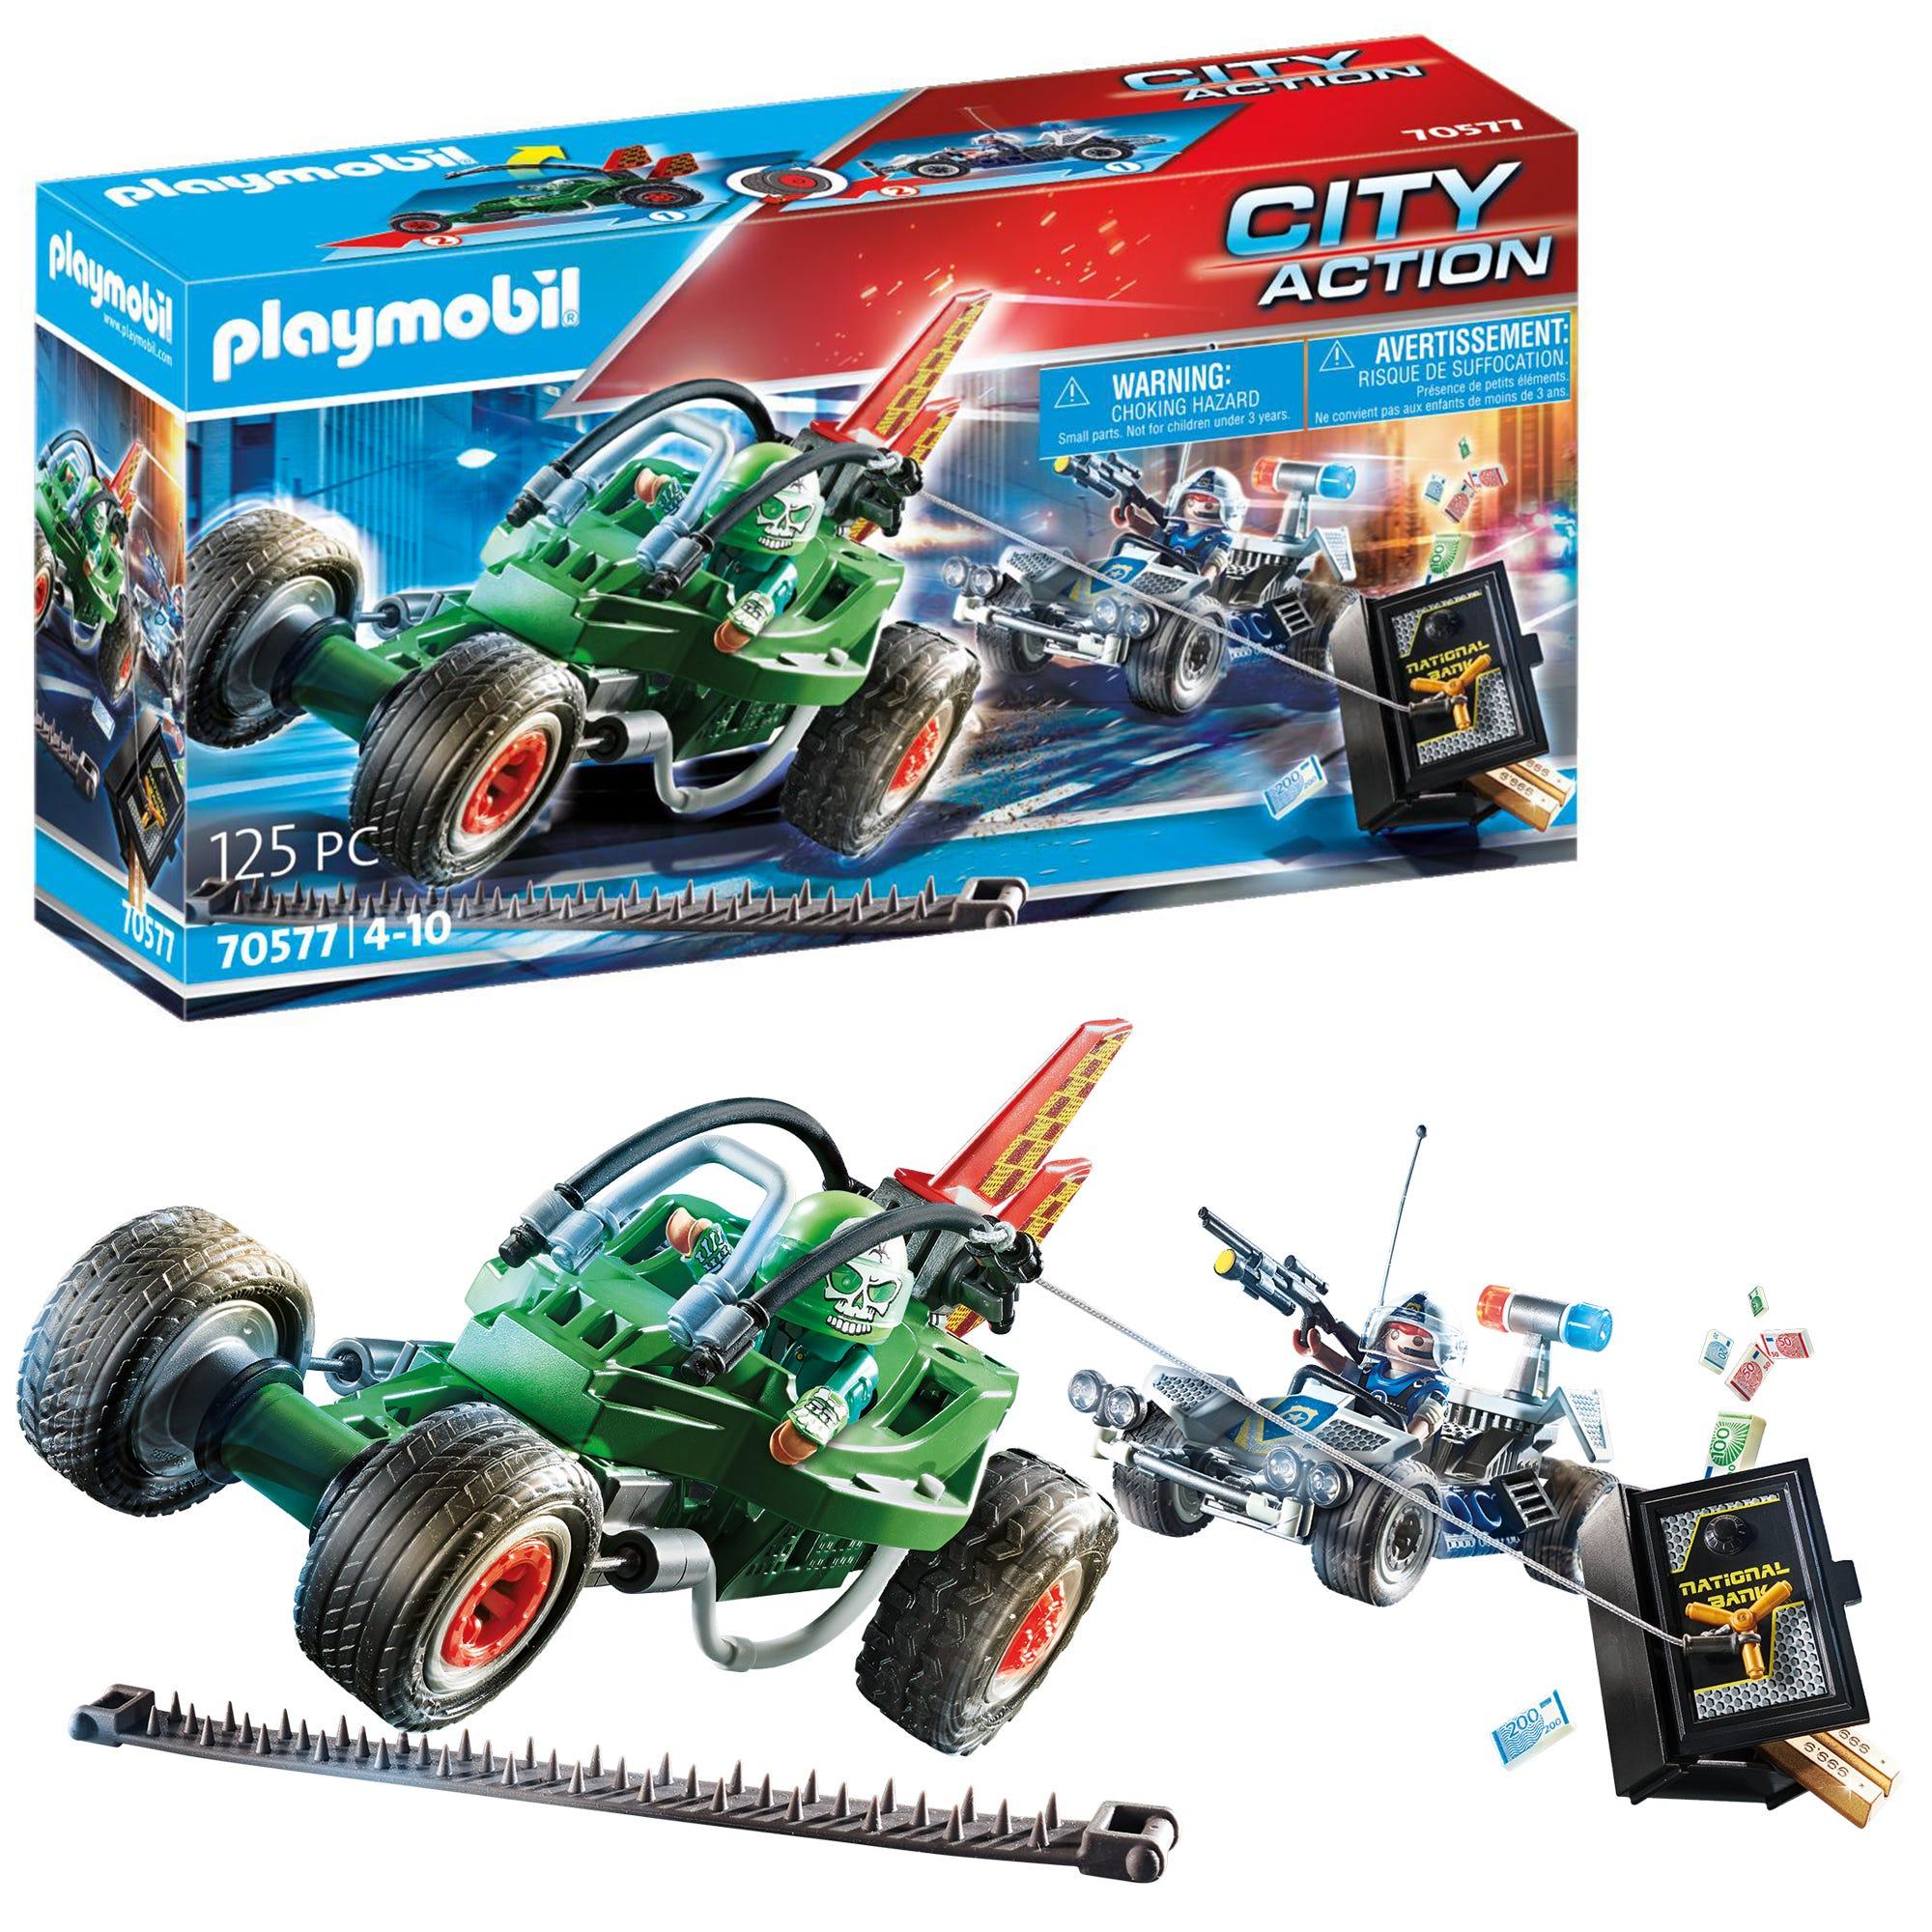 Playmobil 70577 City Action Police Go Kart Escape